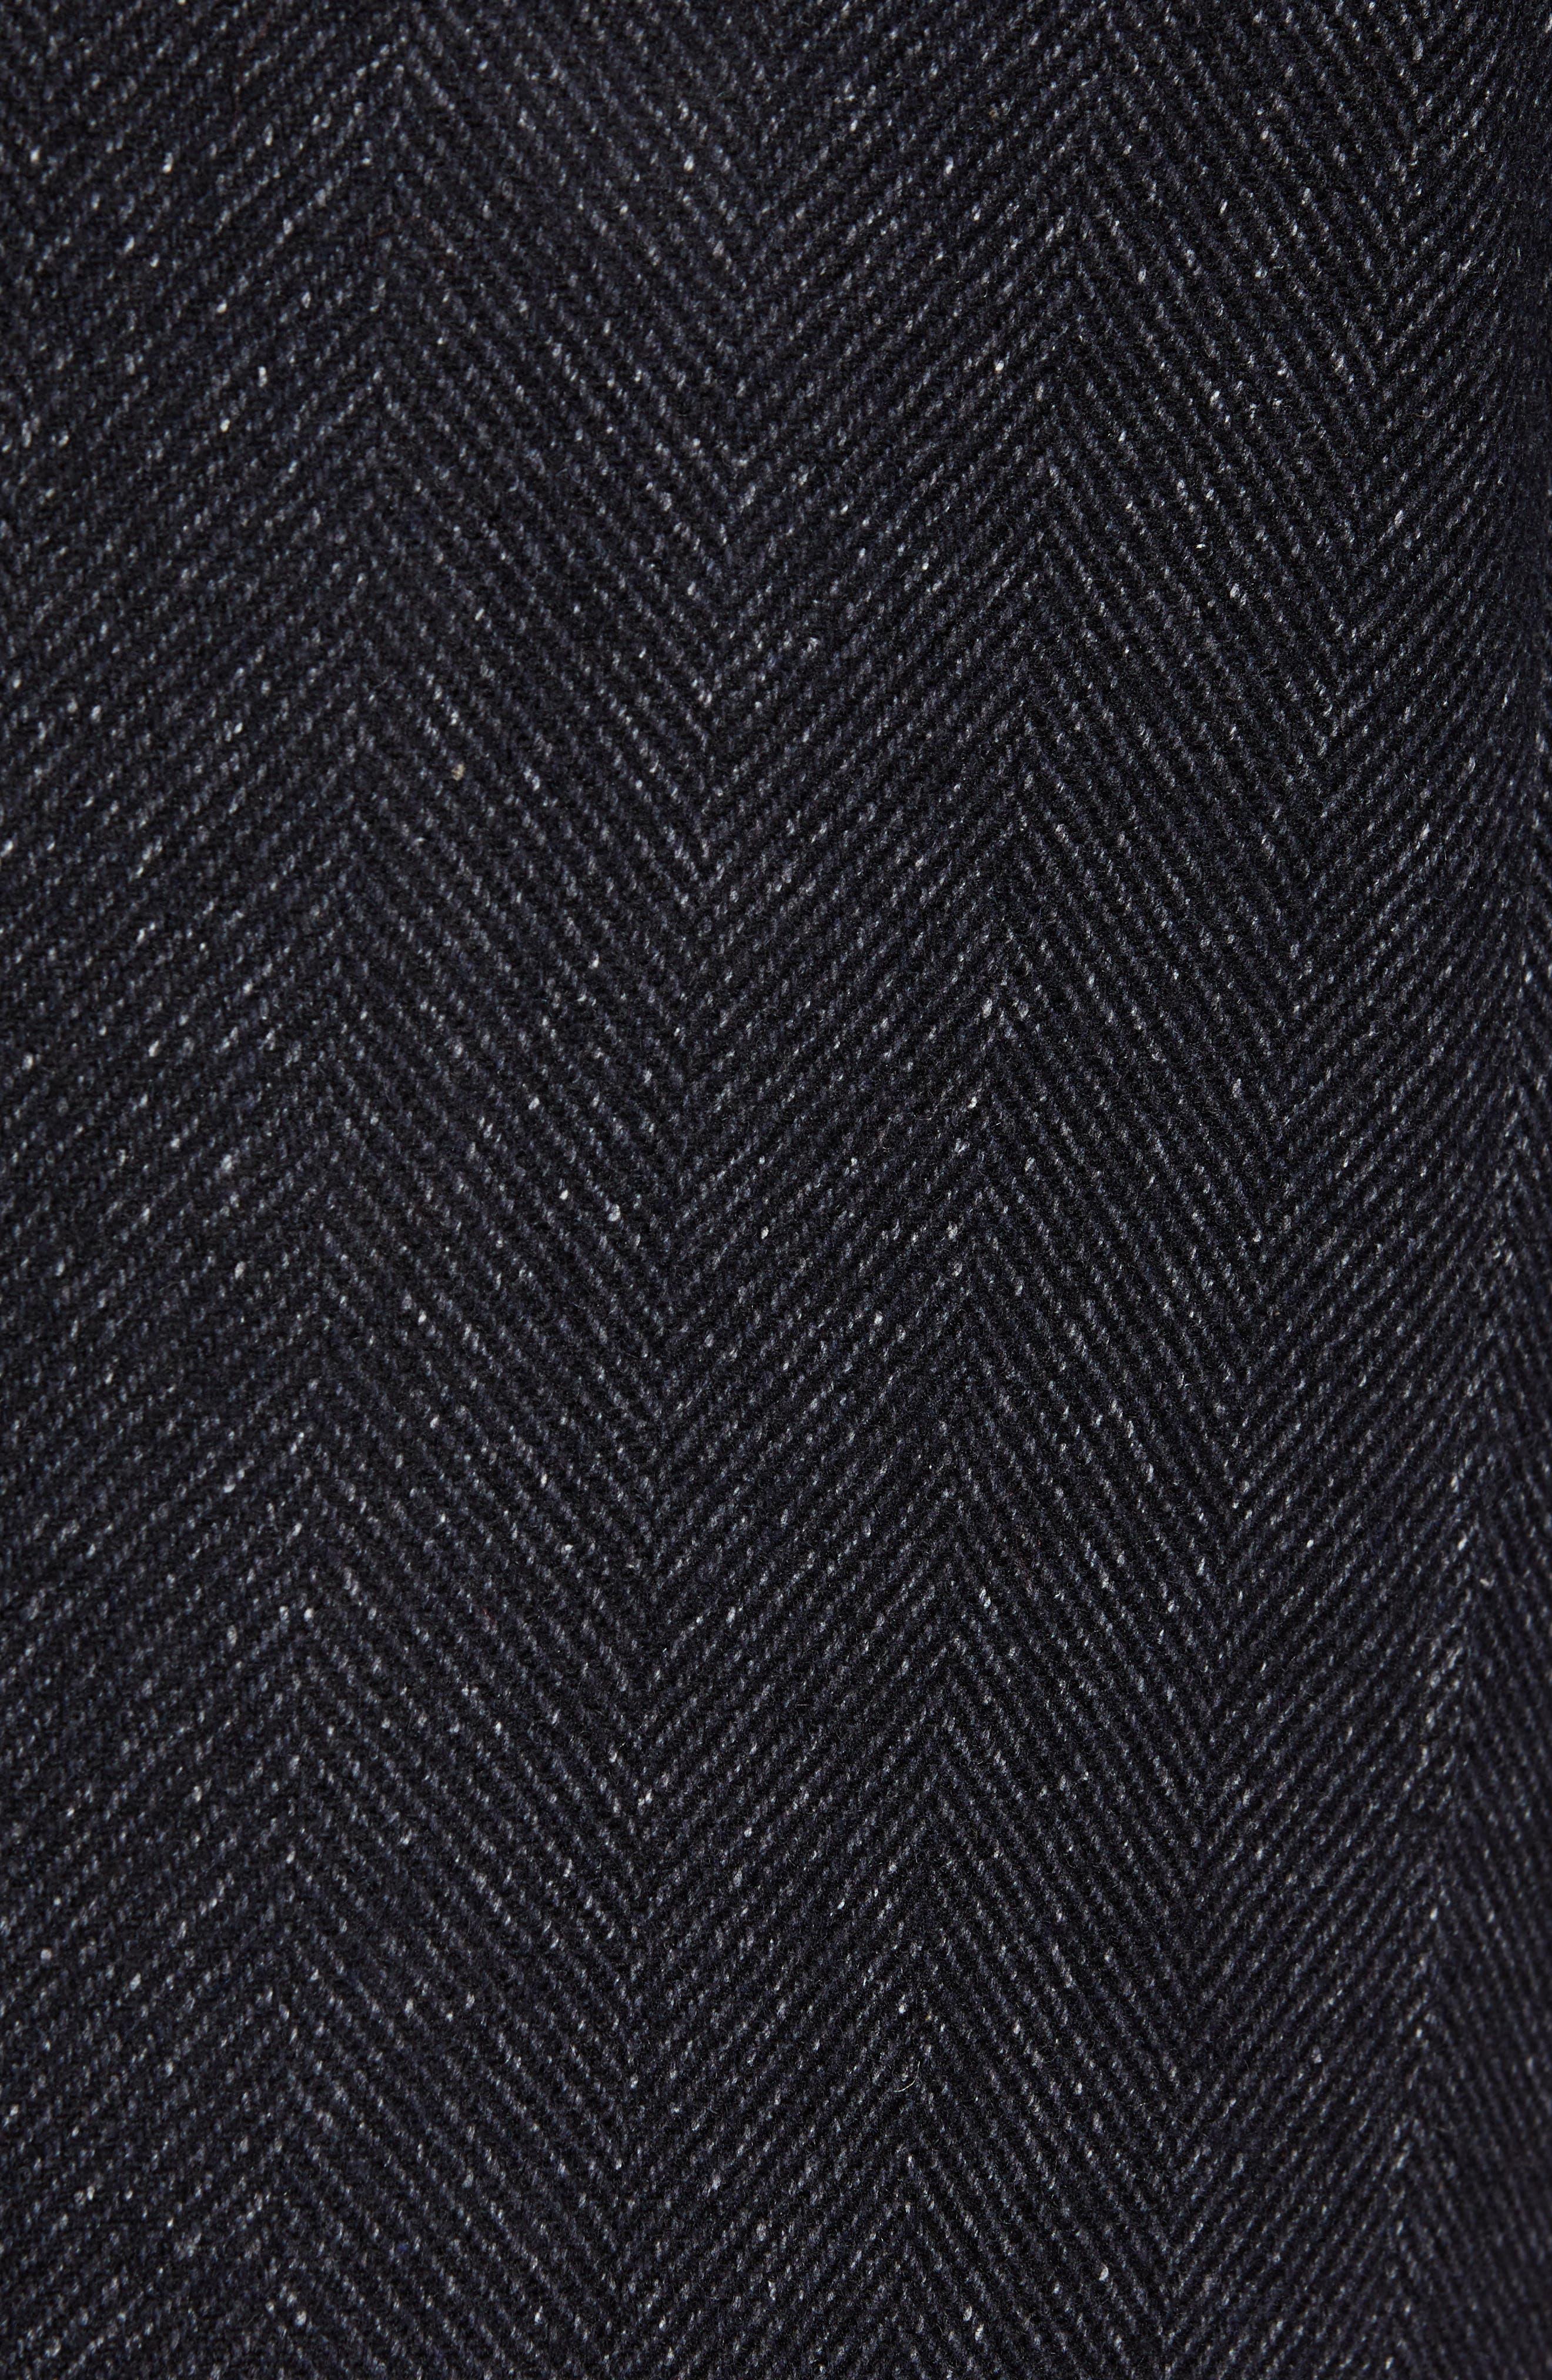 Herringbone Wool Blend Overcoat,                             Alternate thumbnail 6, color,                             NAVY